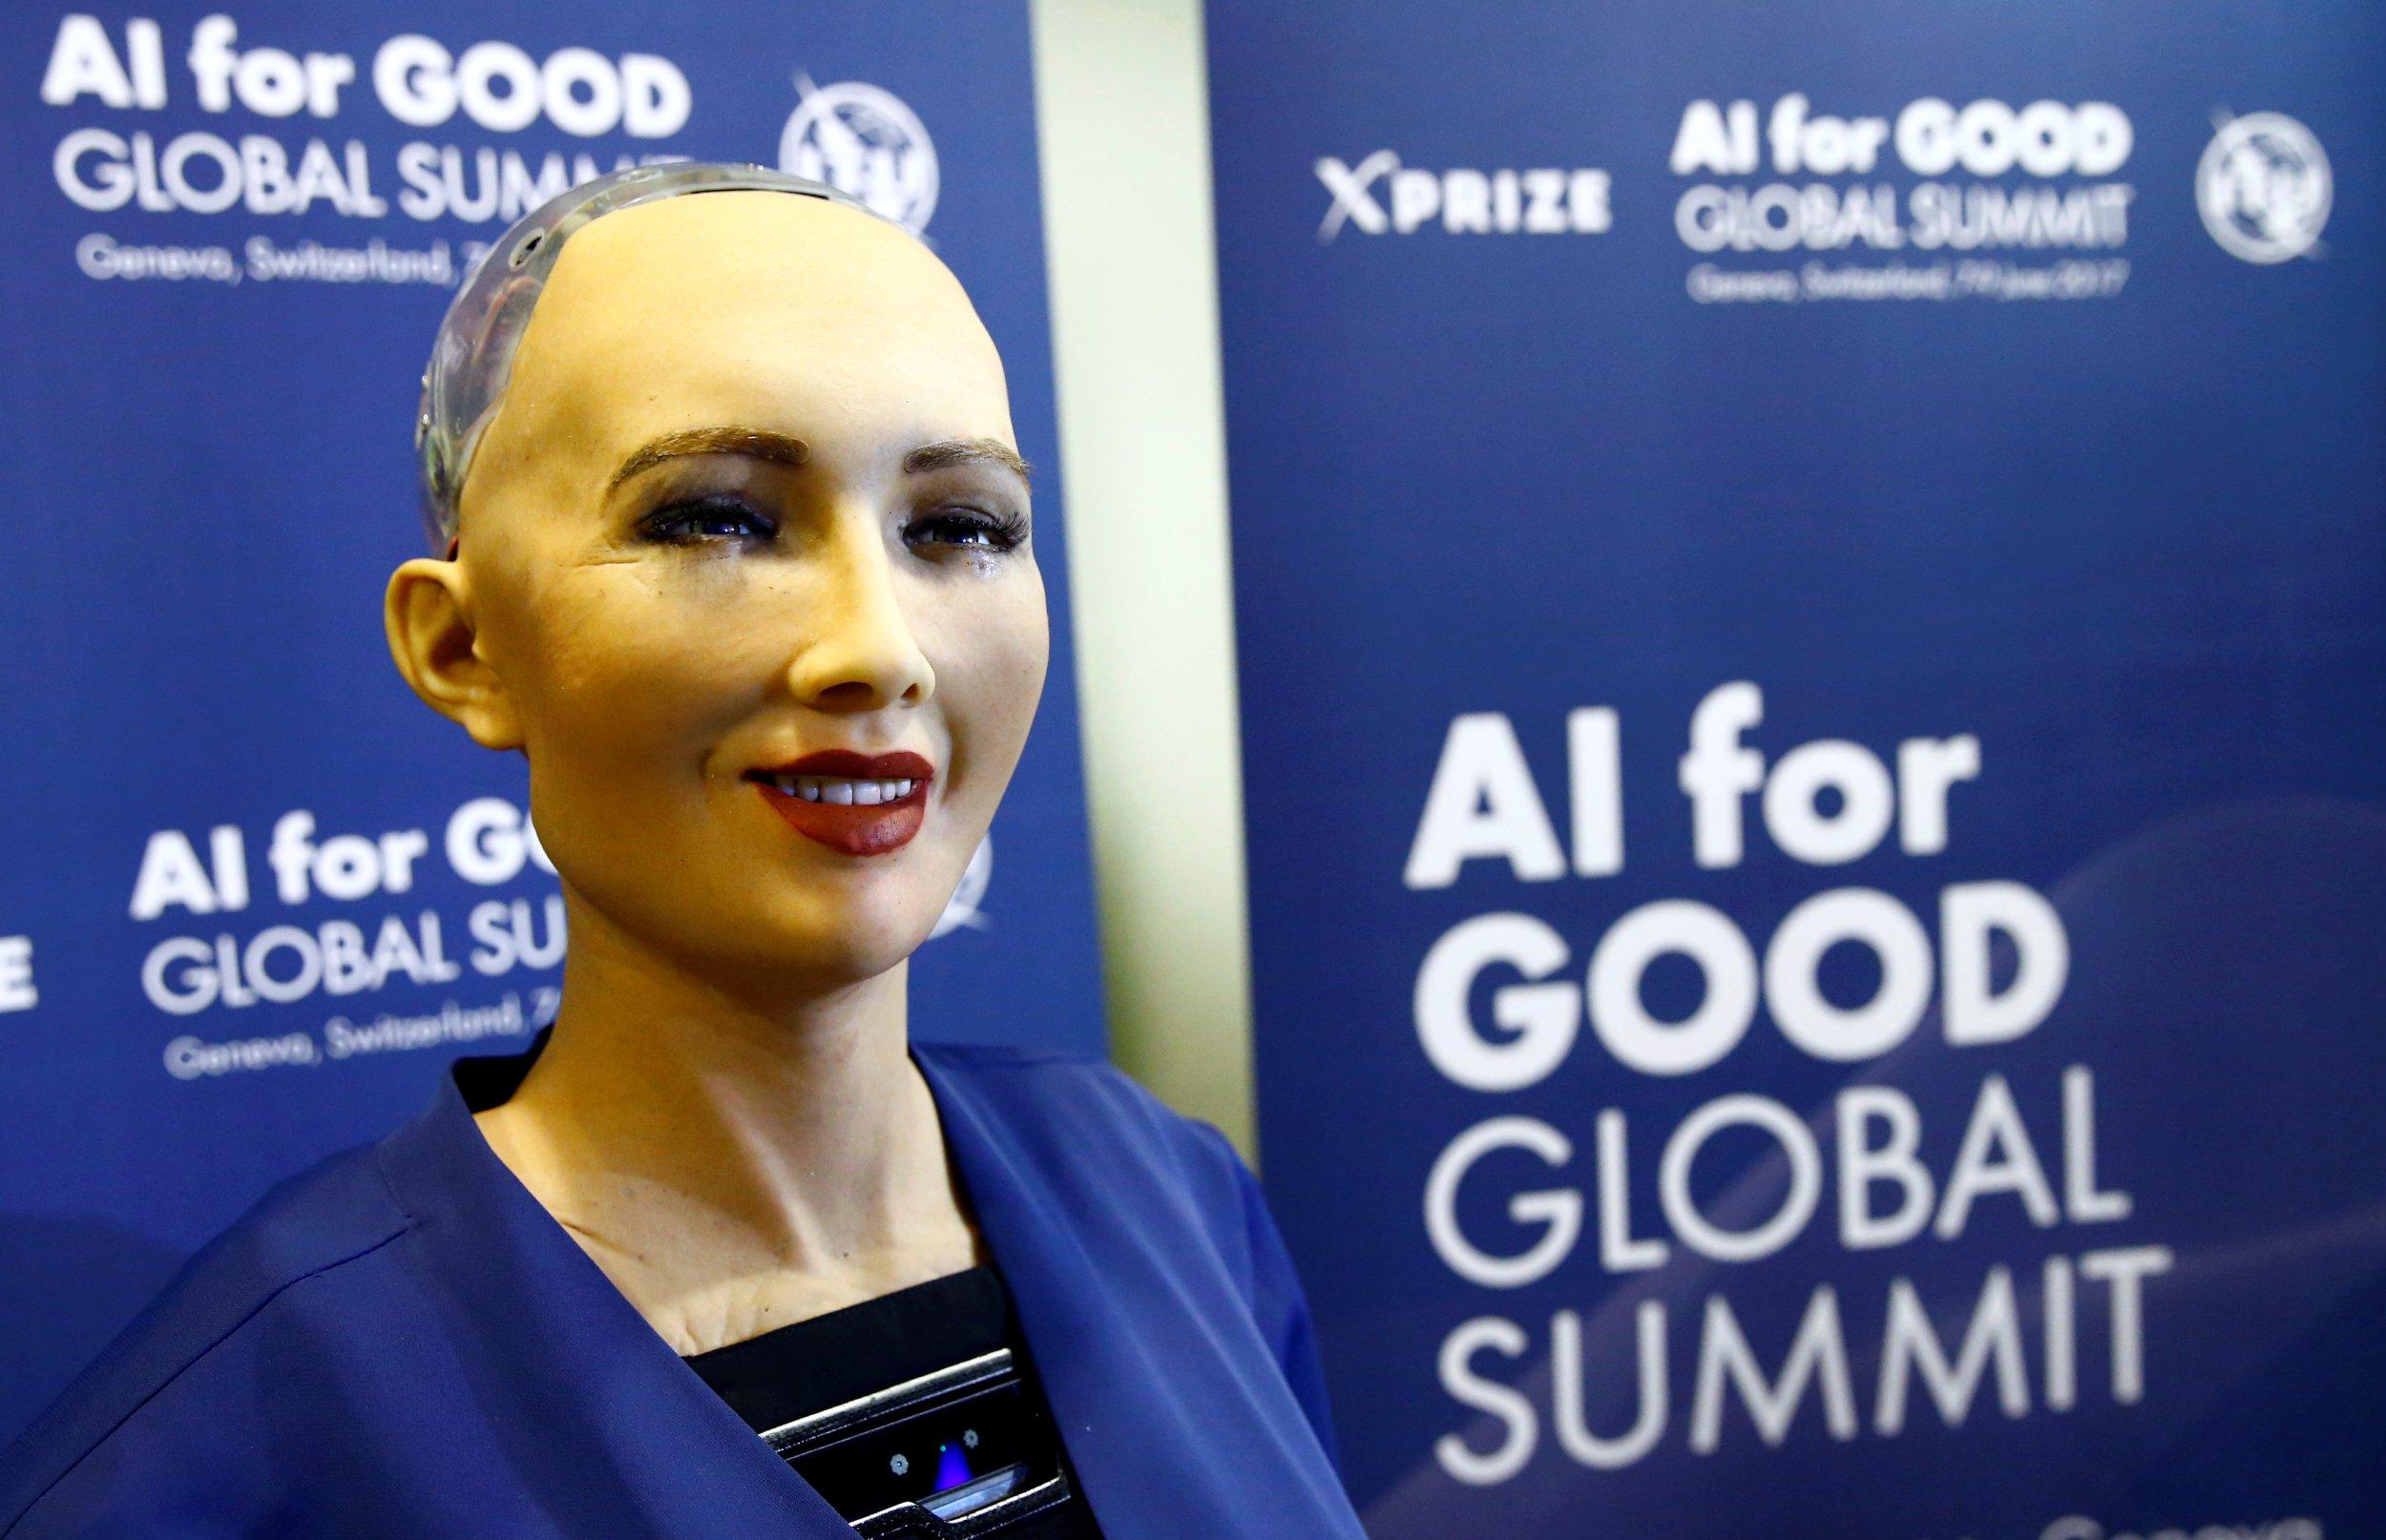 Saudi Arabia Gives Citizenship To A Non Muslim English Speaking Robot